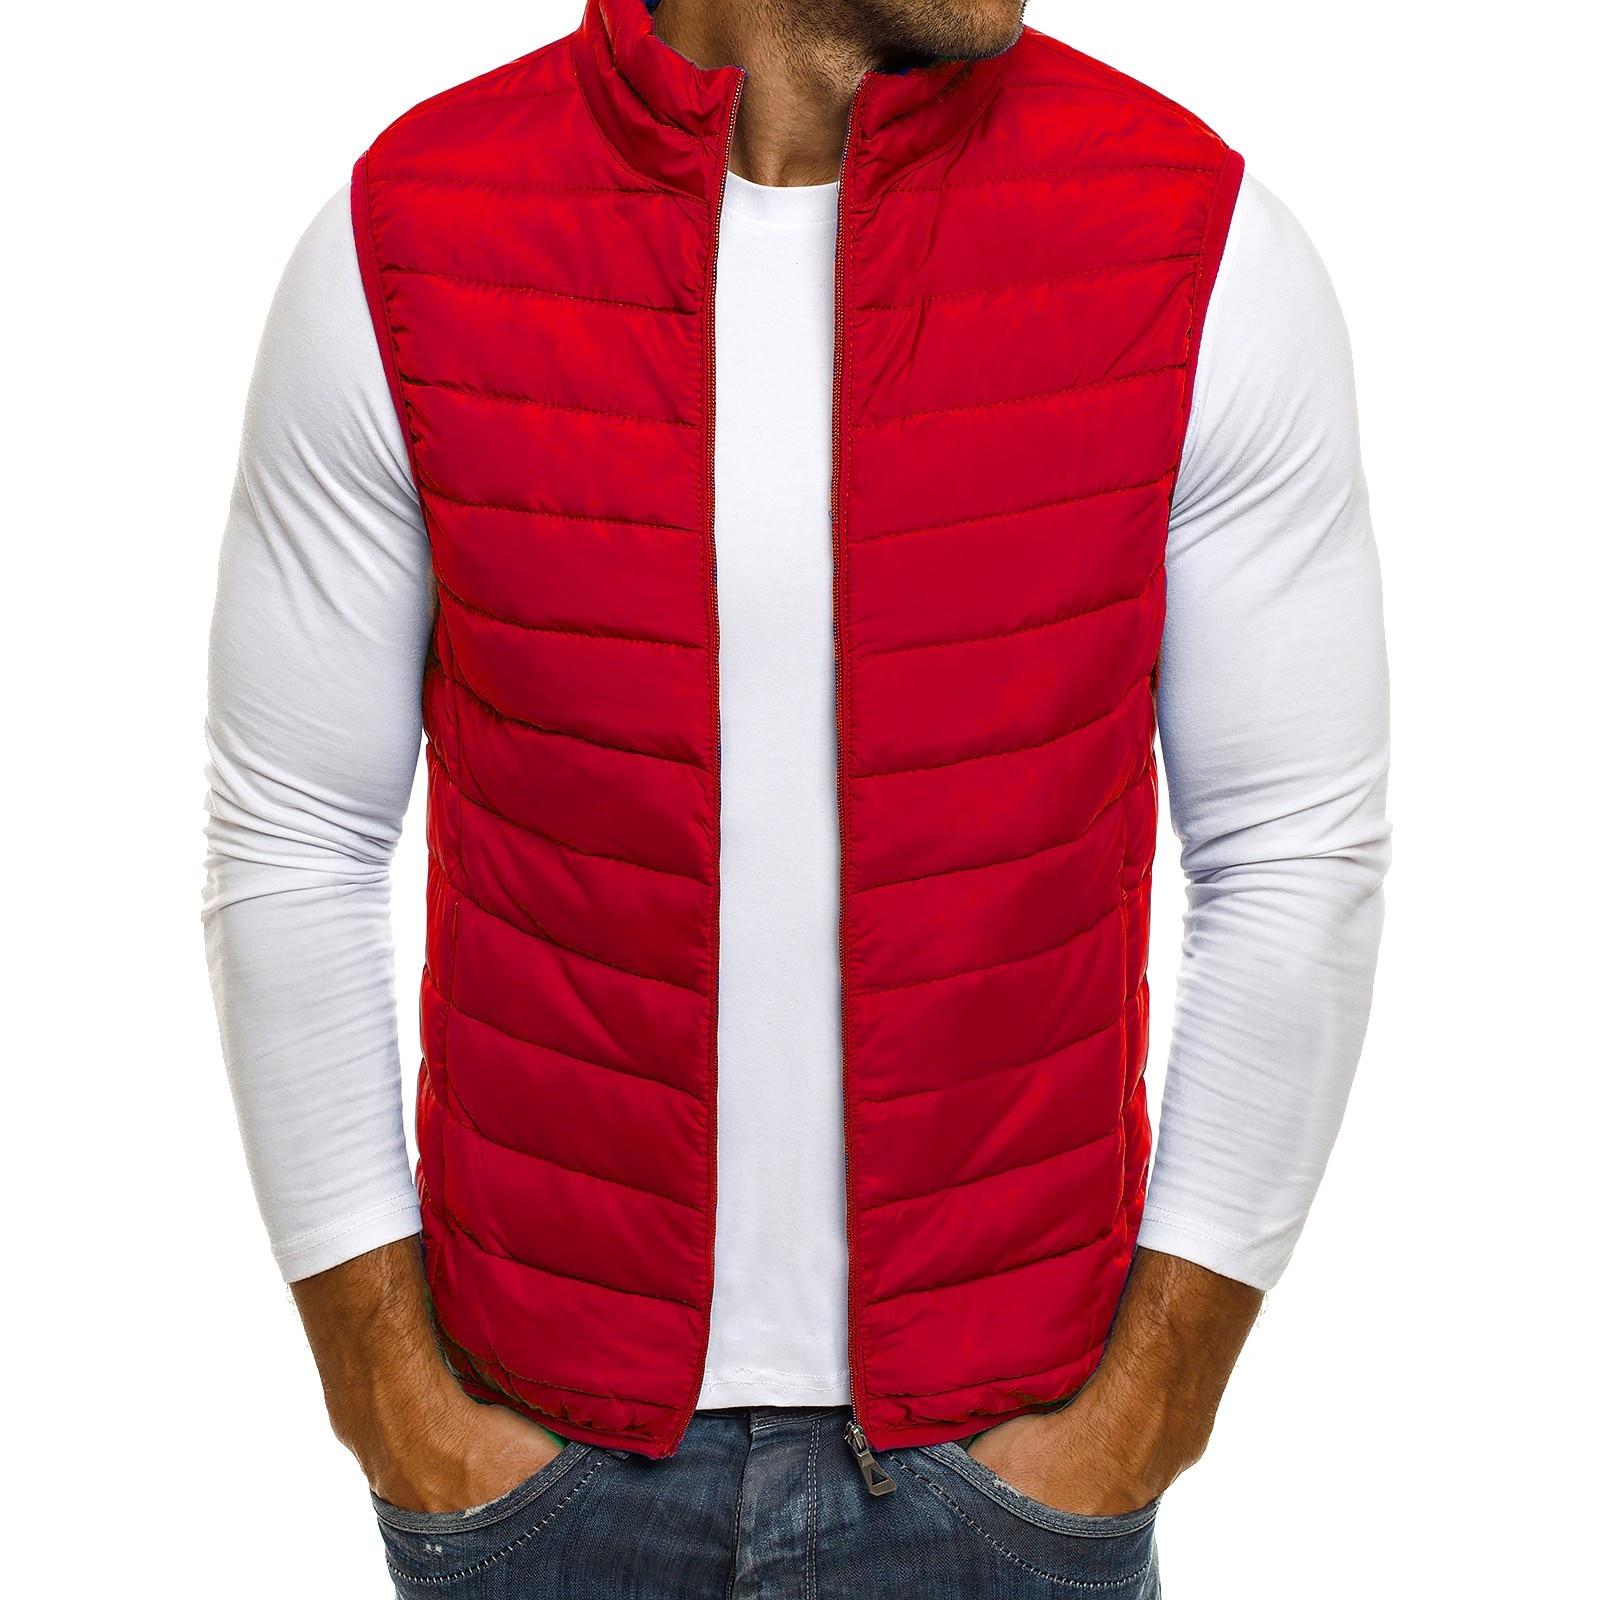 ZOGAA Casual Vest Men Autumn Winter Jackets Thick Vests Man Sleeveless Coats Male Warm Cotton-Padded Waistcoat men gilet veste